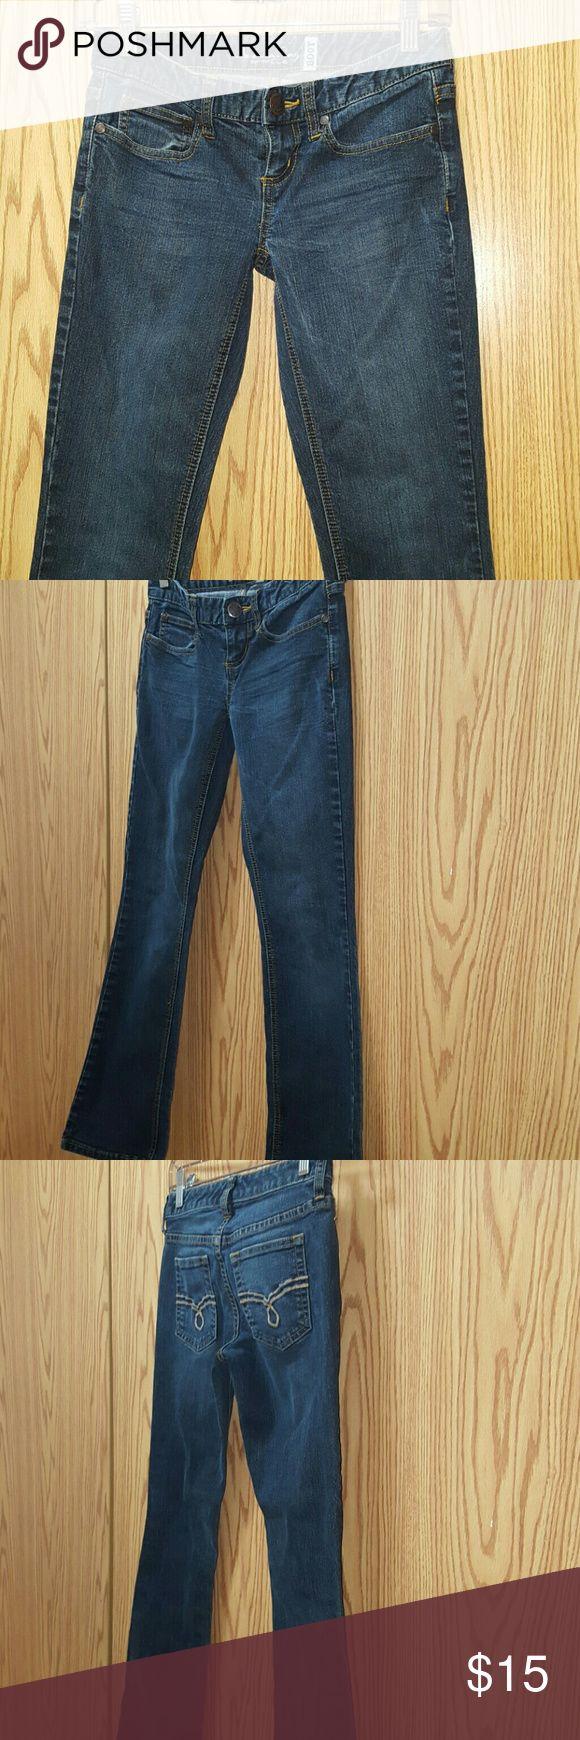 American Rag Boot cut Jeans NWOT Size 0/S American Rag Jeans Boot Cut